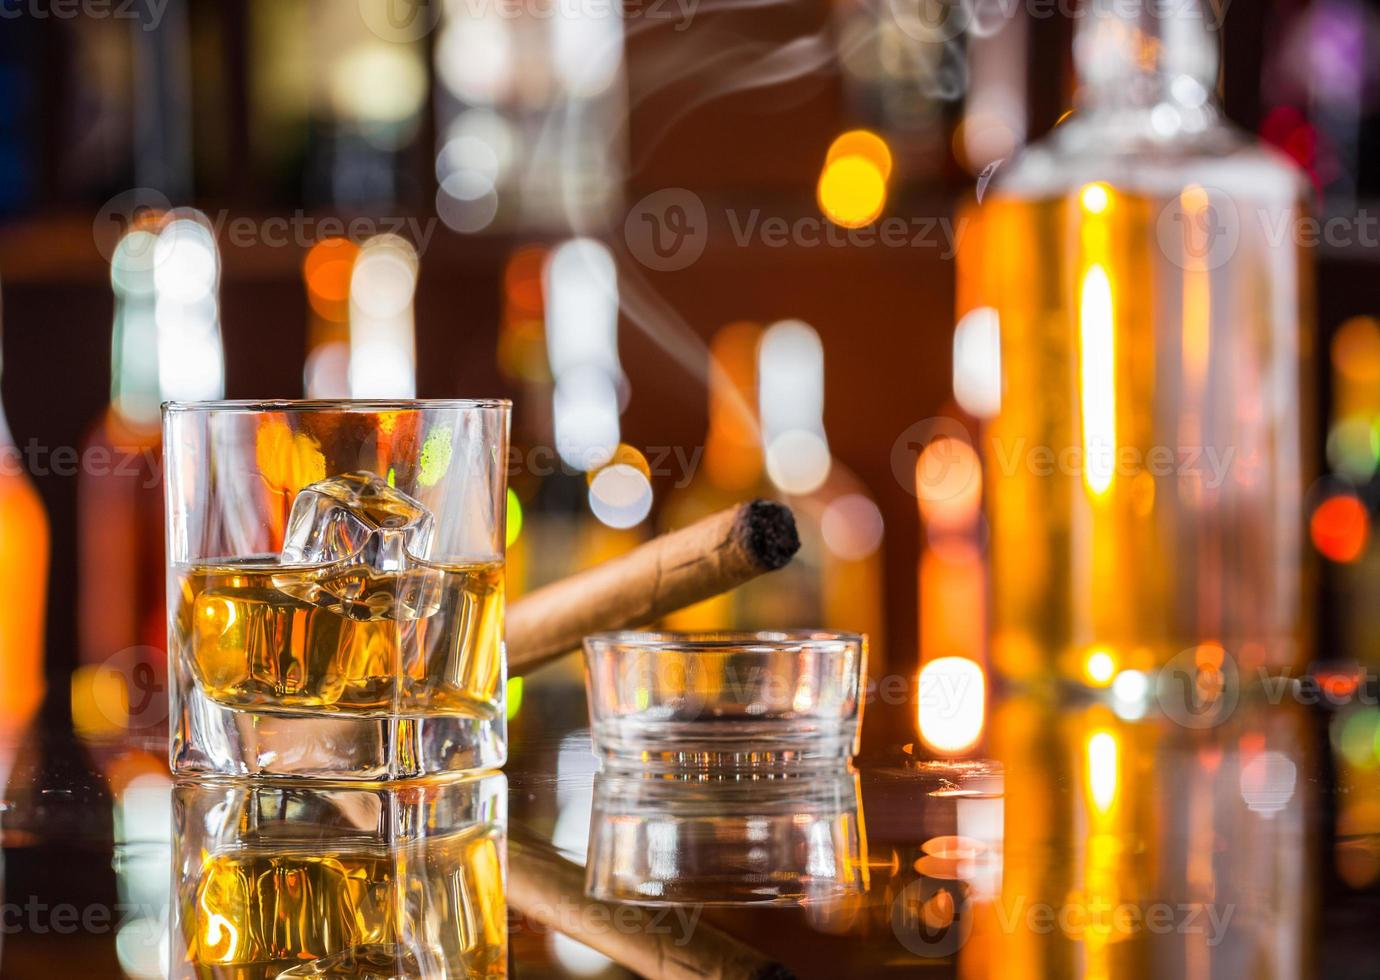 whiskidryck med rökande cigarr på baren foto